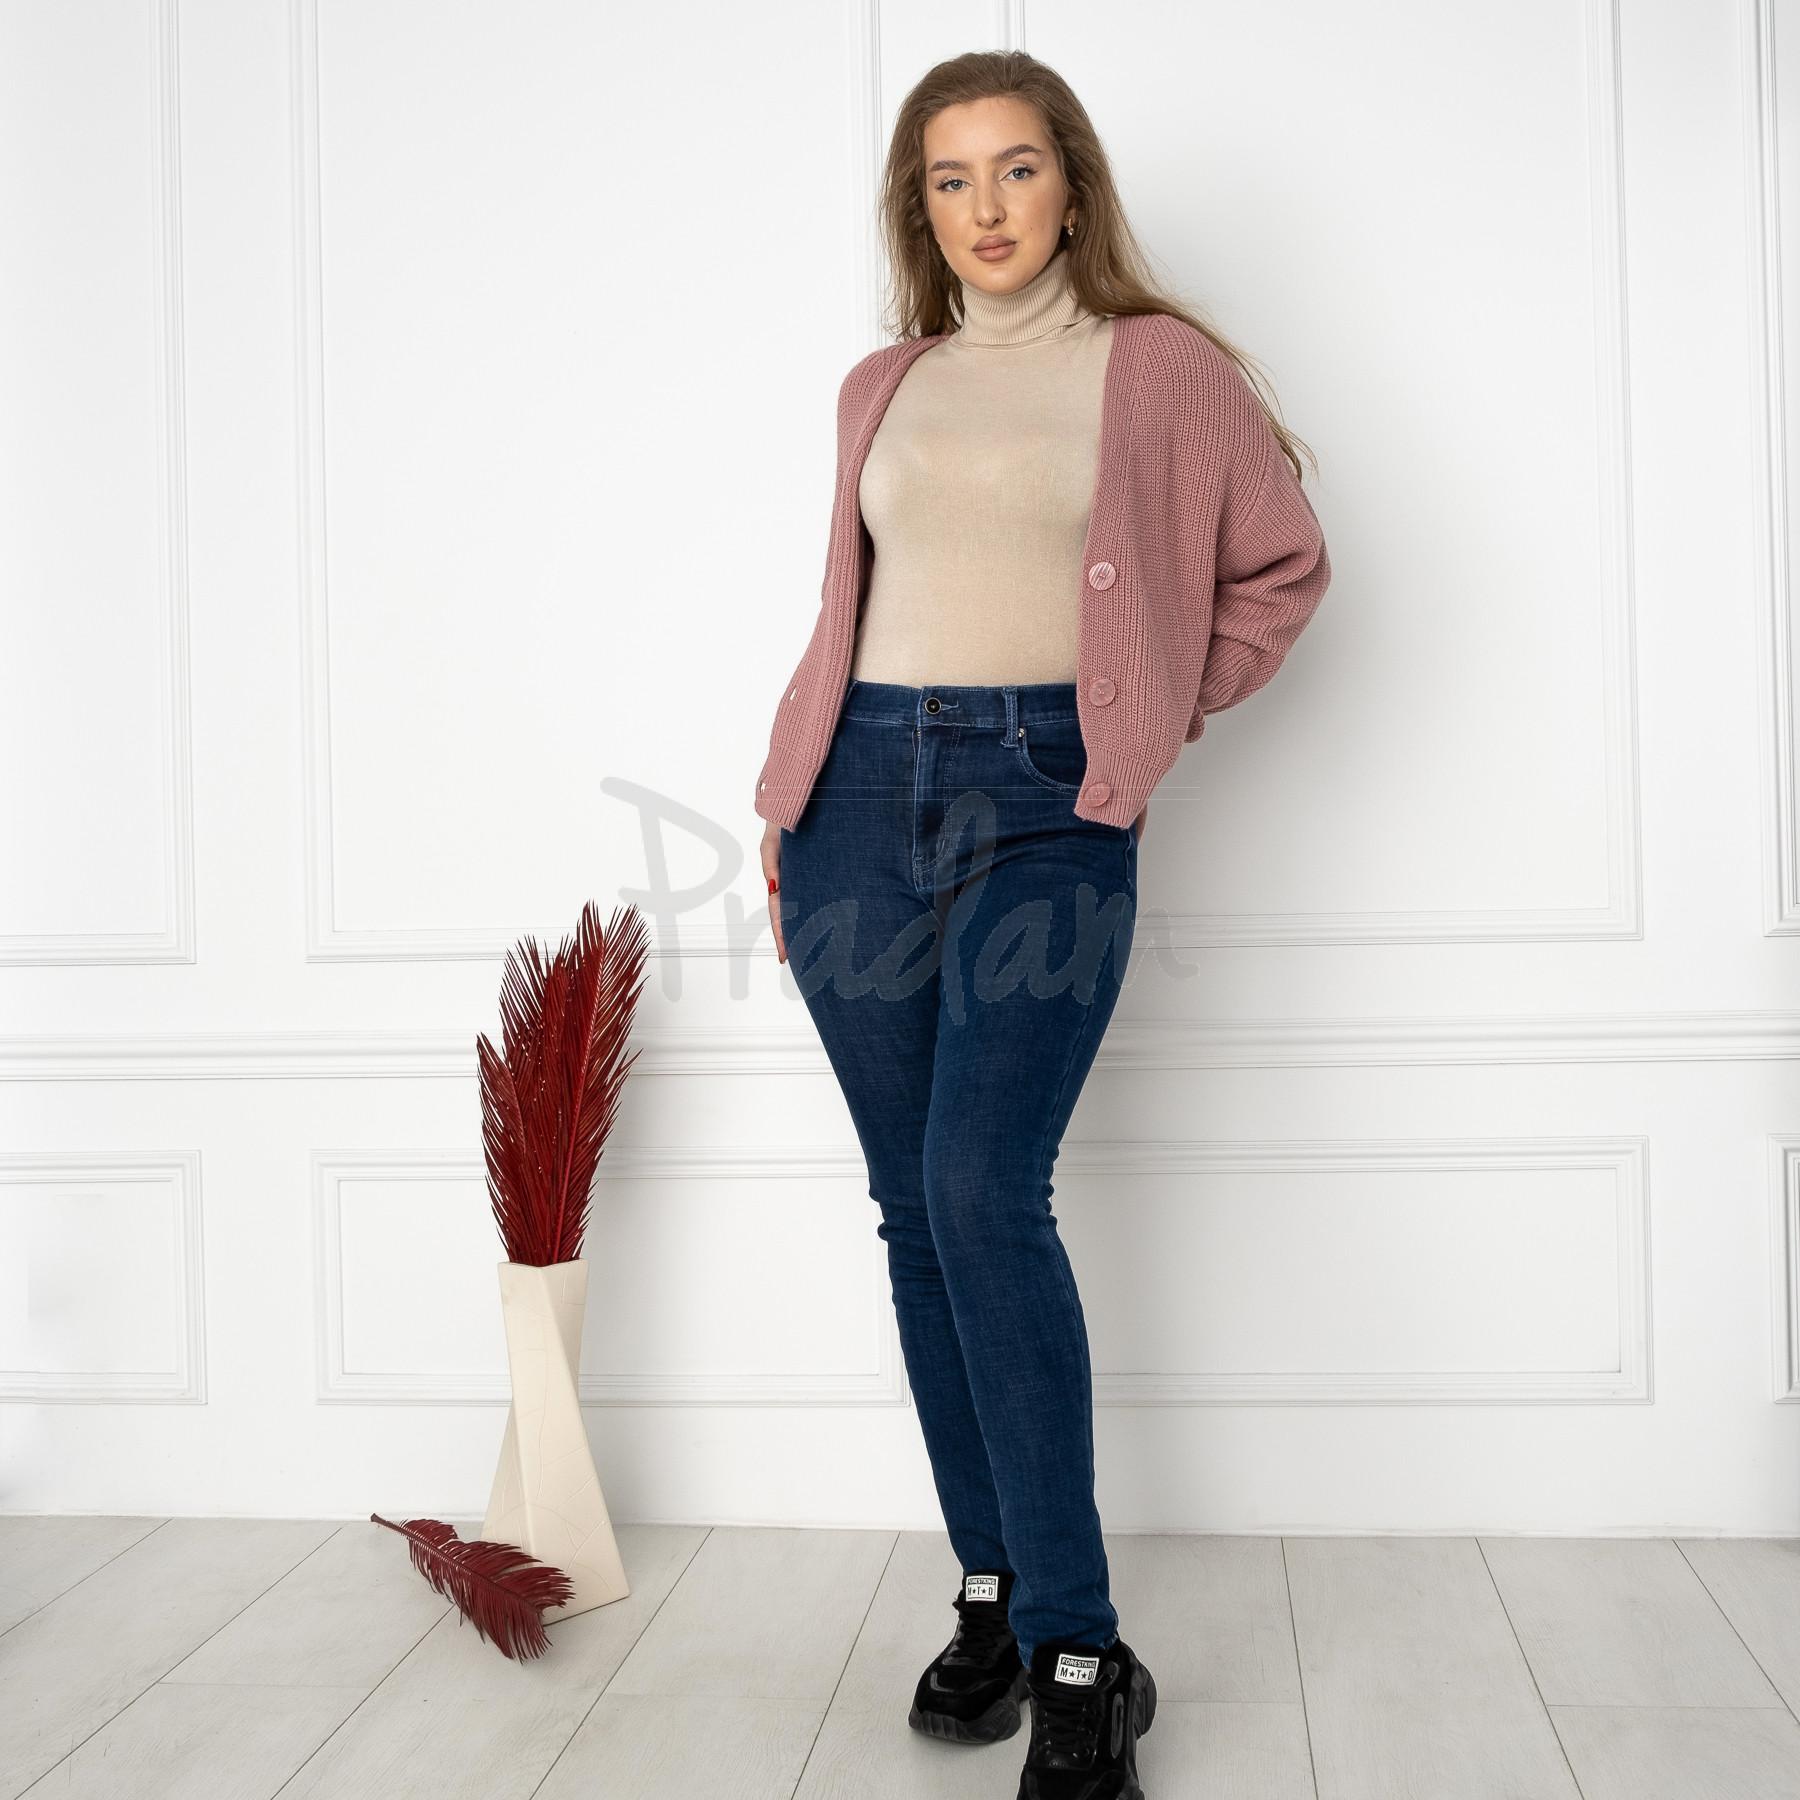 6022 New Jeans американка на флисе батальная синяя стрейчевая (6 ед.размеры: 31.32.33.34.35.36)